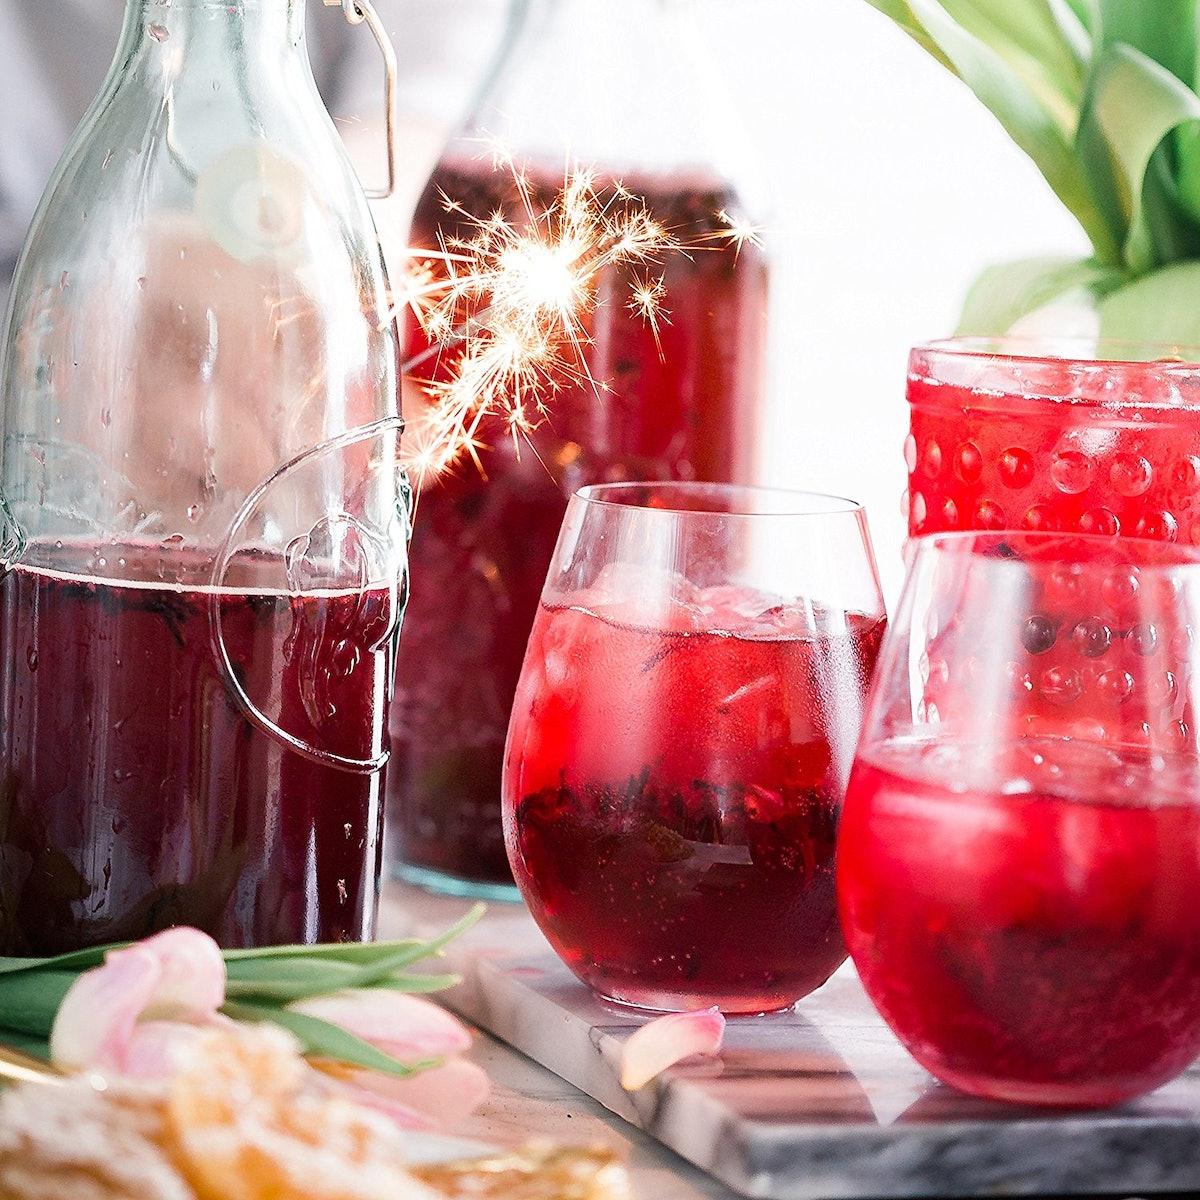 Poolside Creations Unbreakable Stemless Plastic Wine Glasses